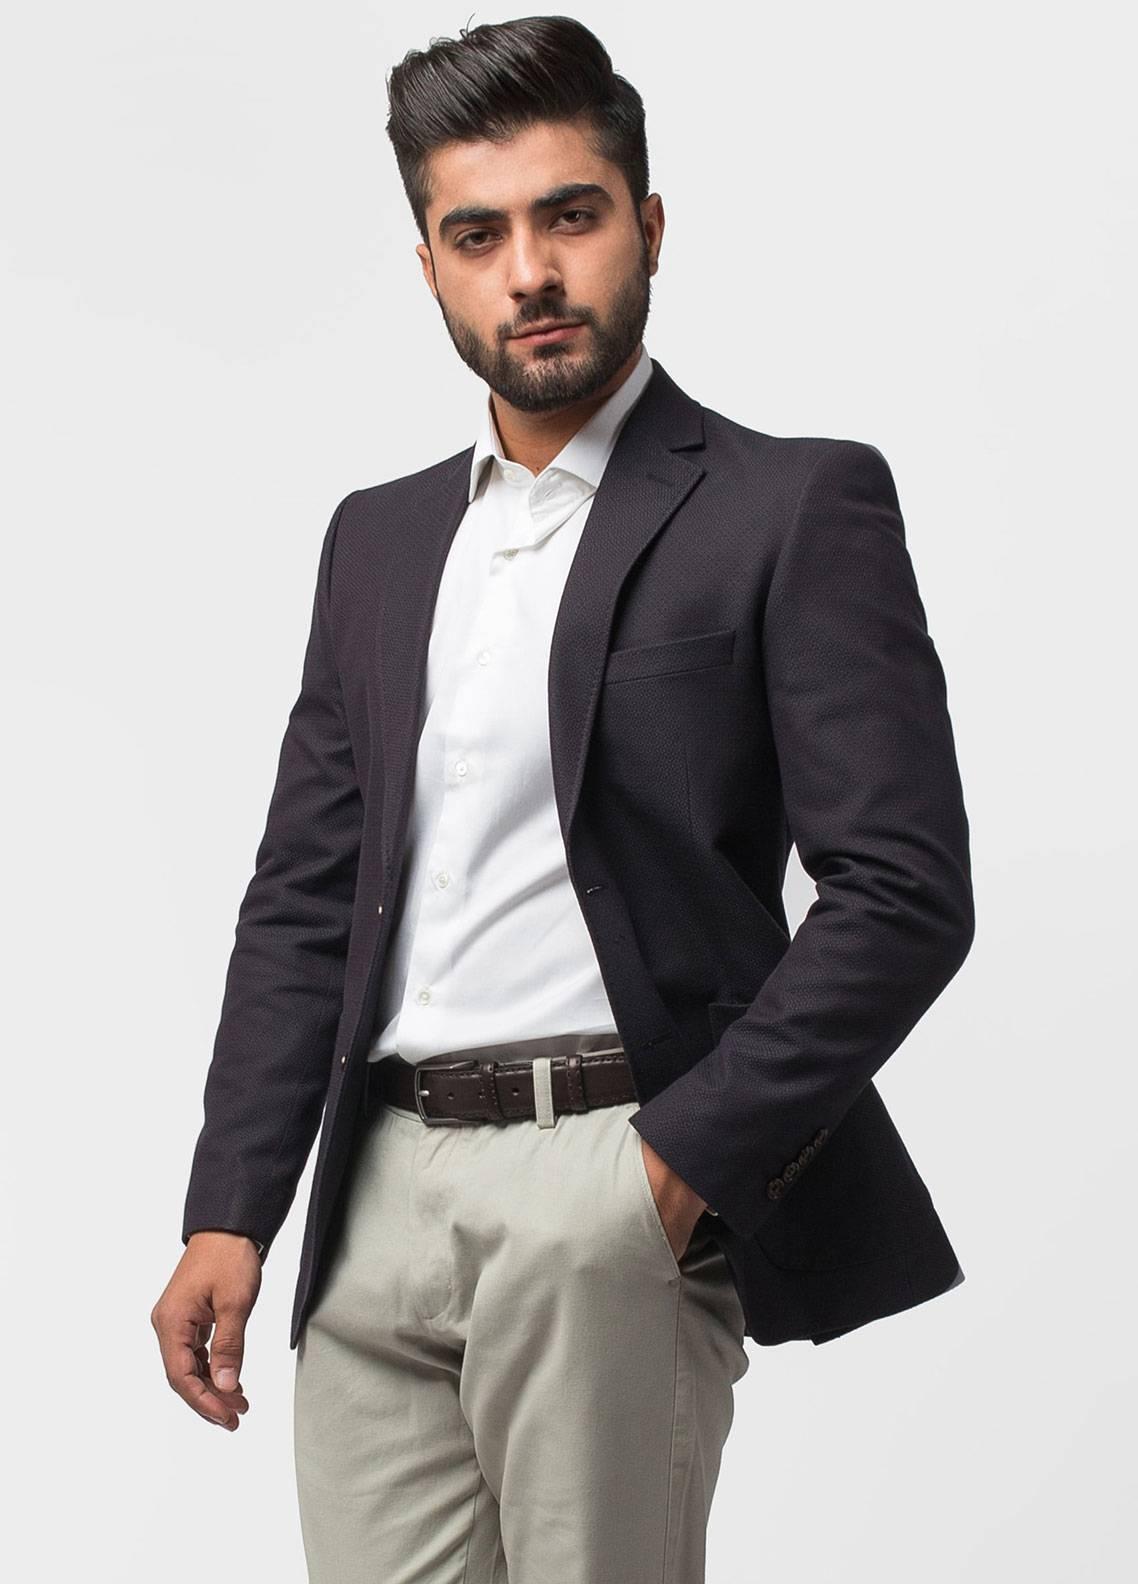 Brumano Cotton Casual Blazer for Men - Black Patterned Bordo